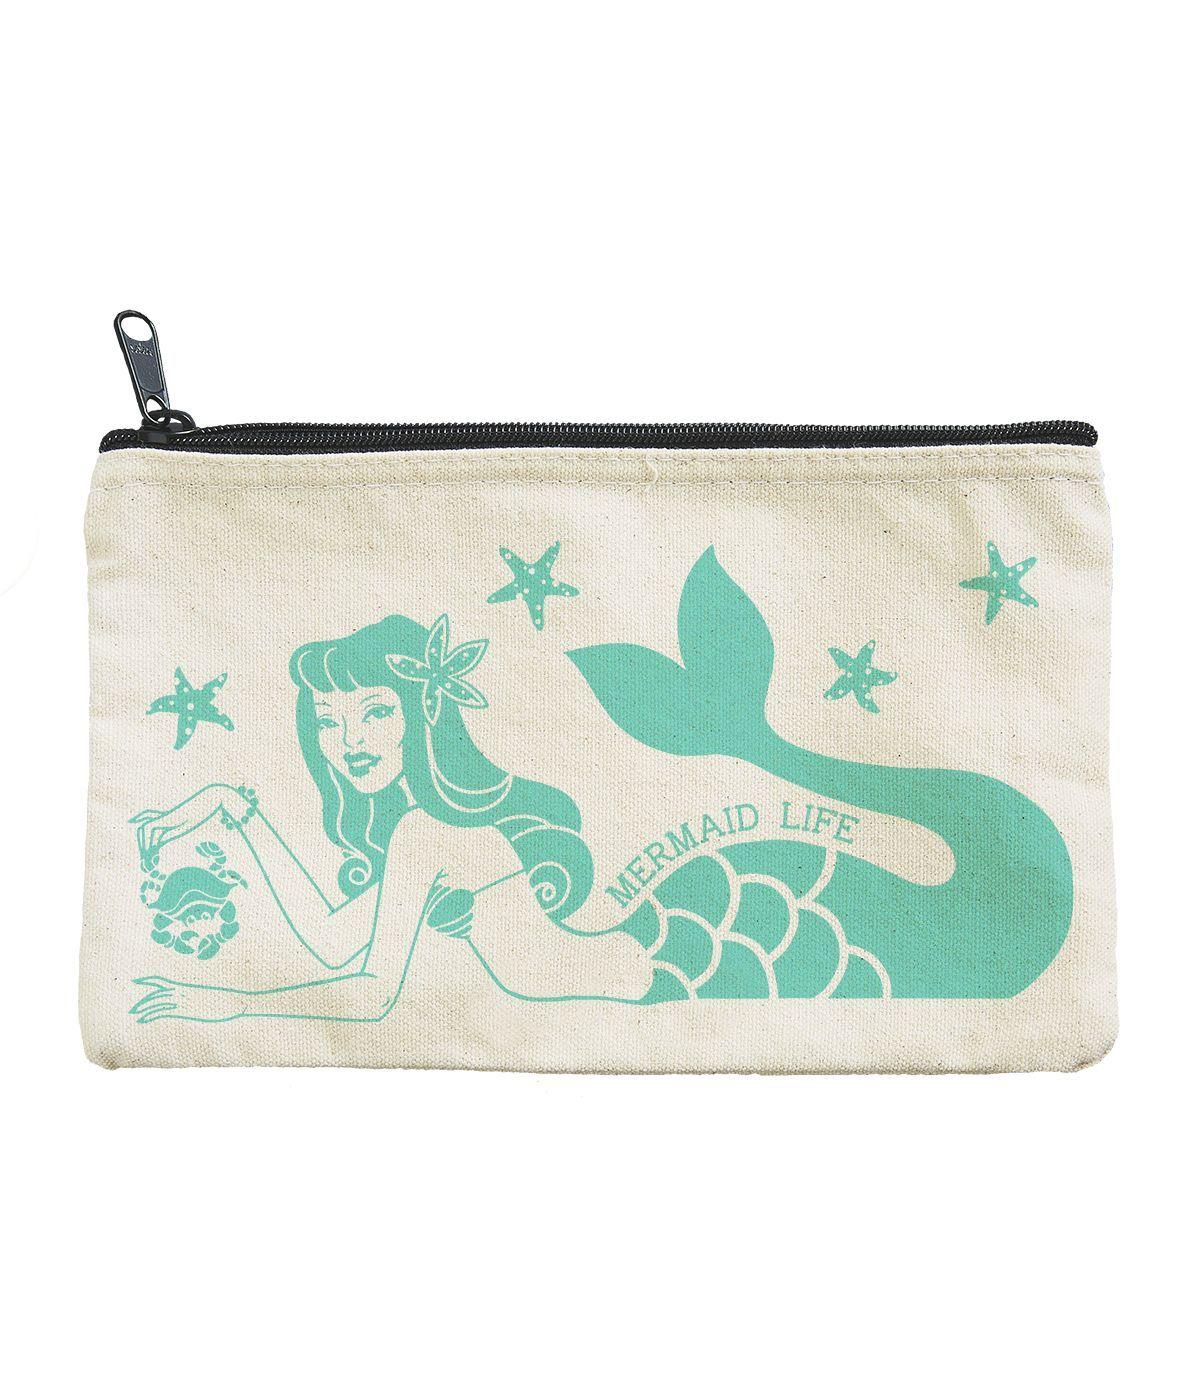 Mermaid Life Pouch